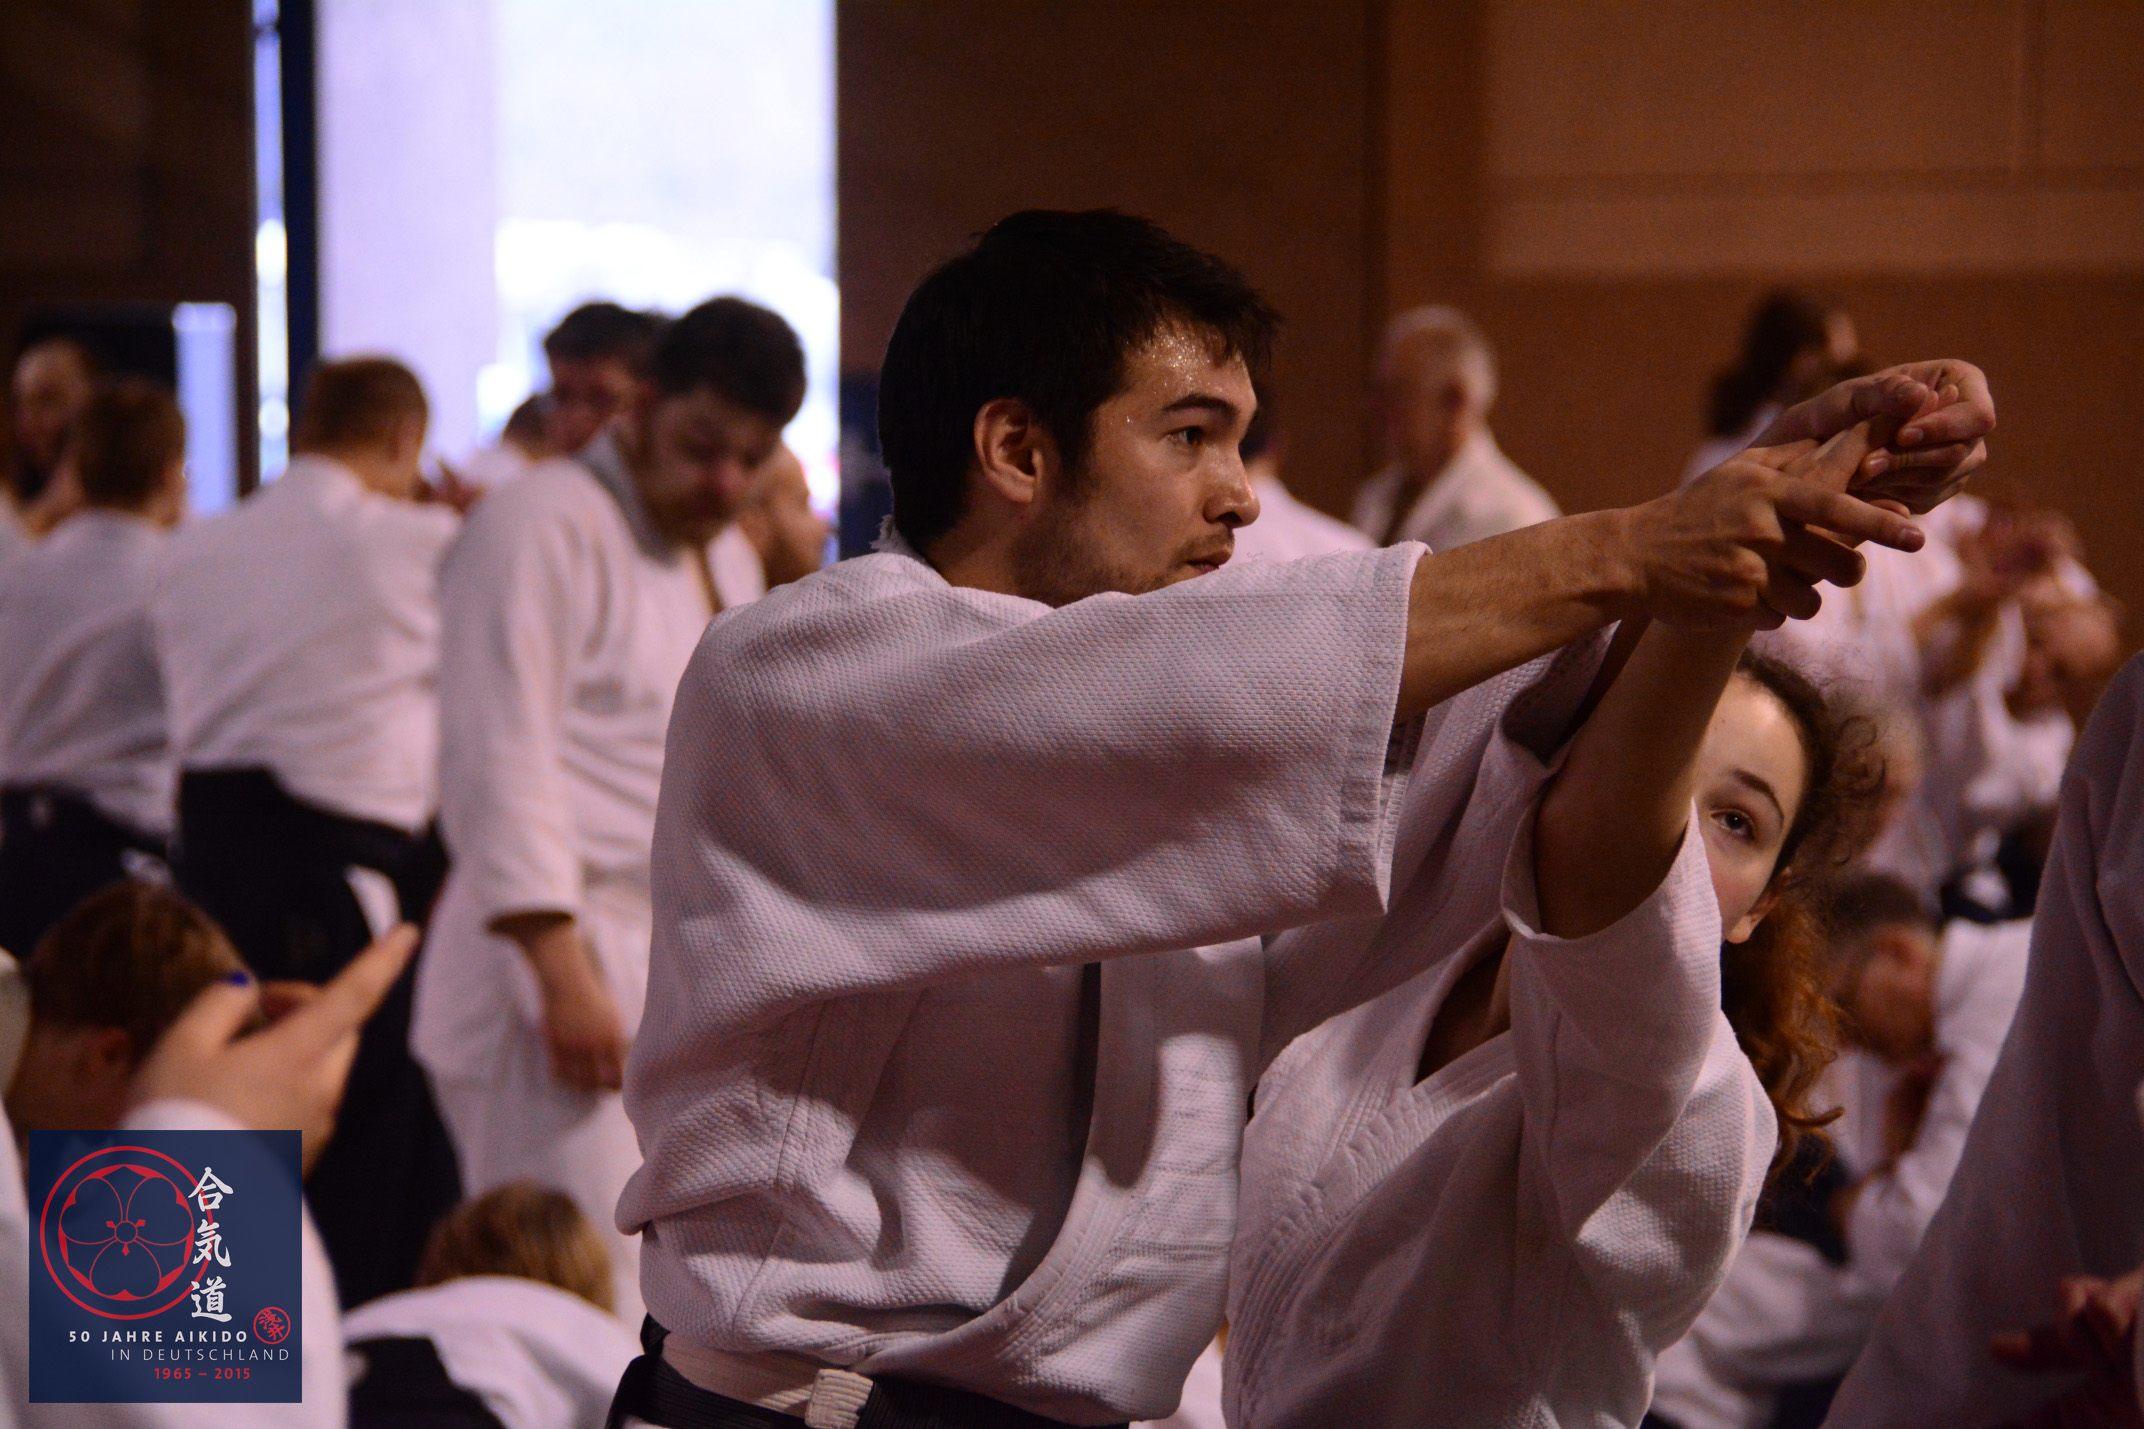 Training Meister Asai